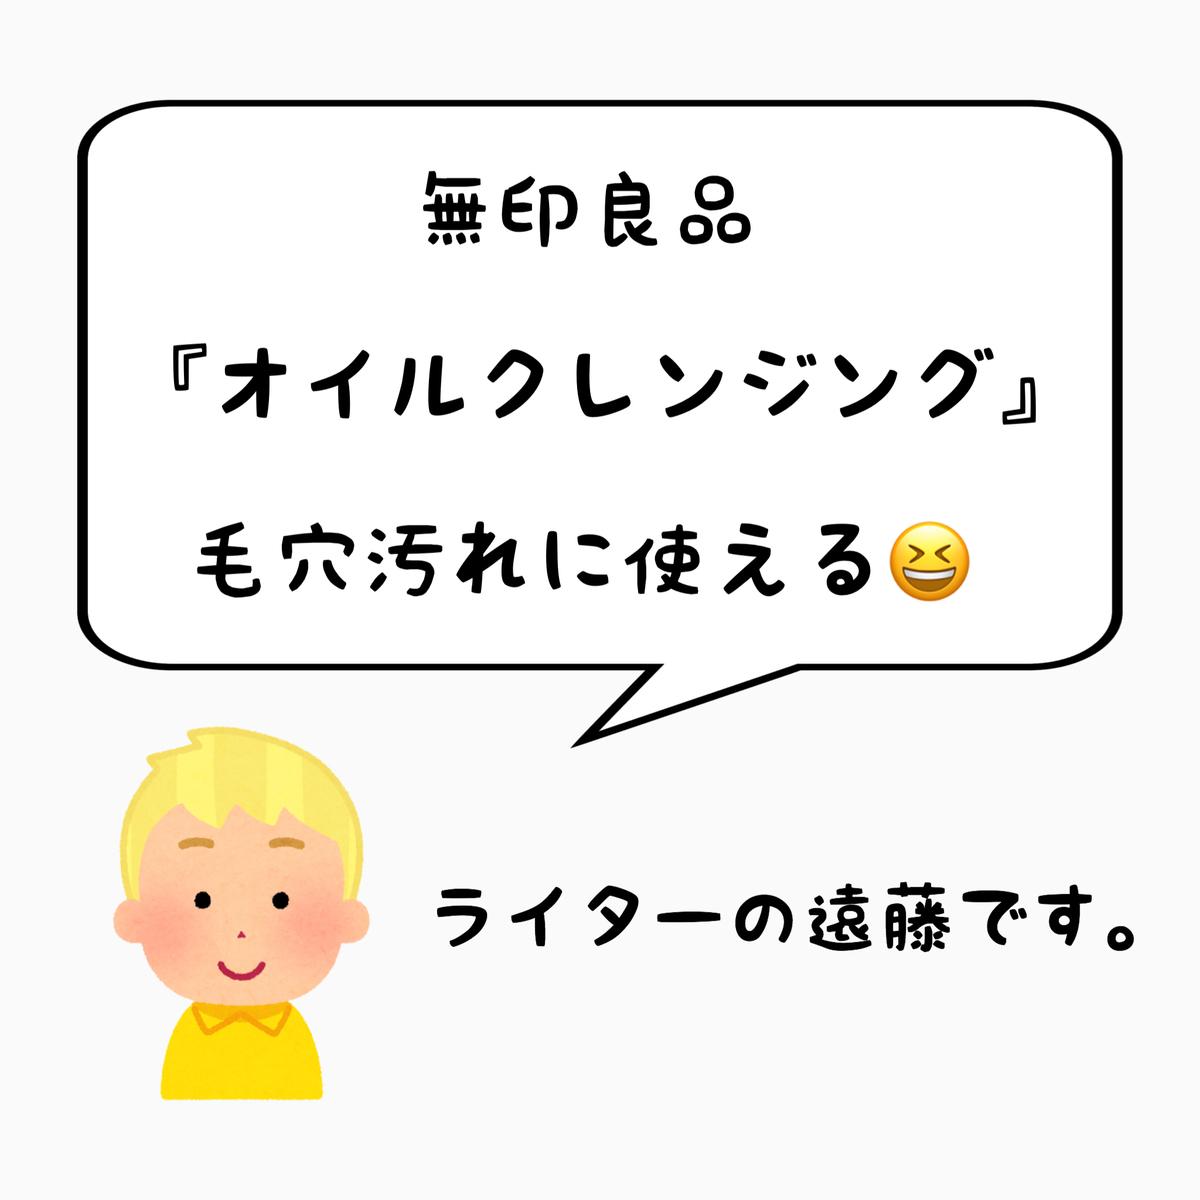 f:id:nokonoko_o:20201008141053j:plain